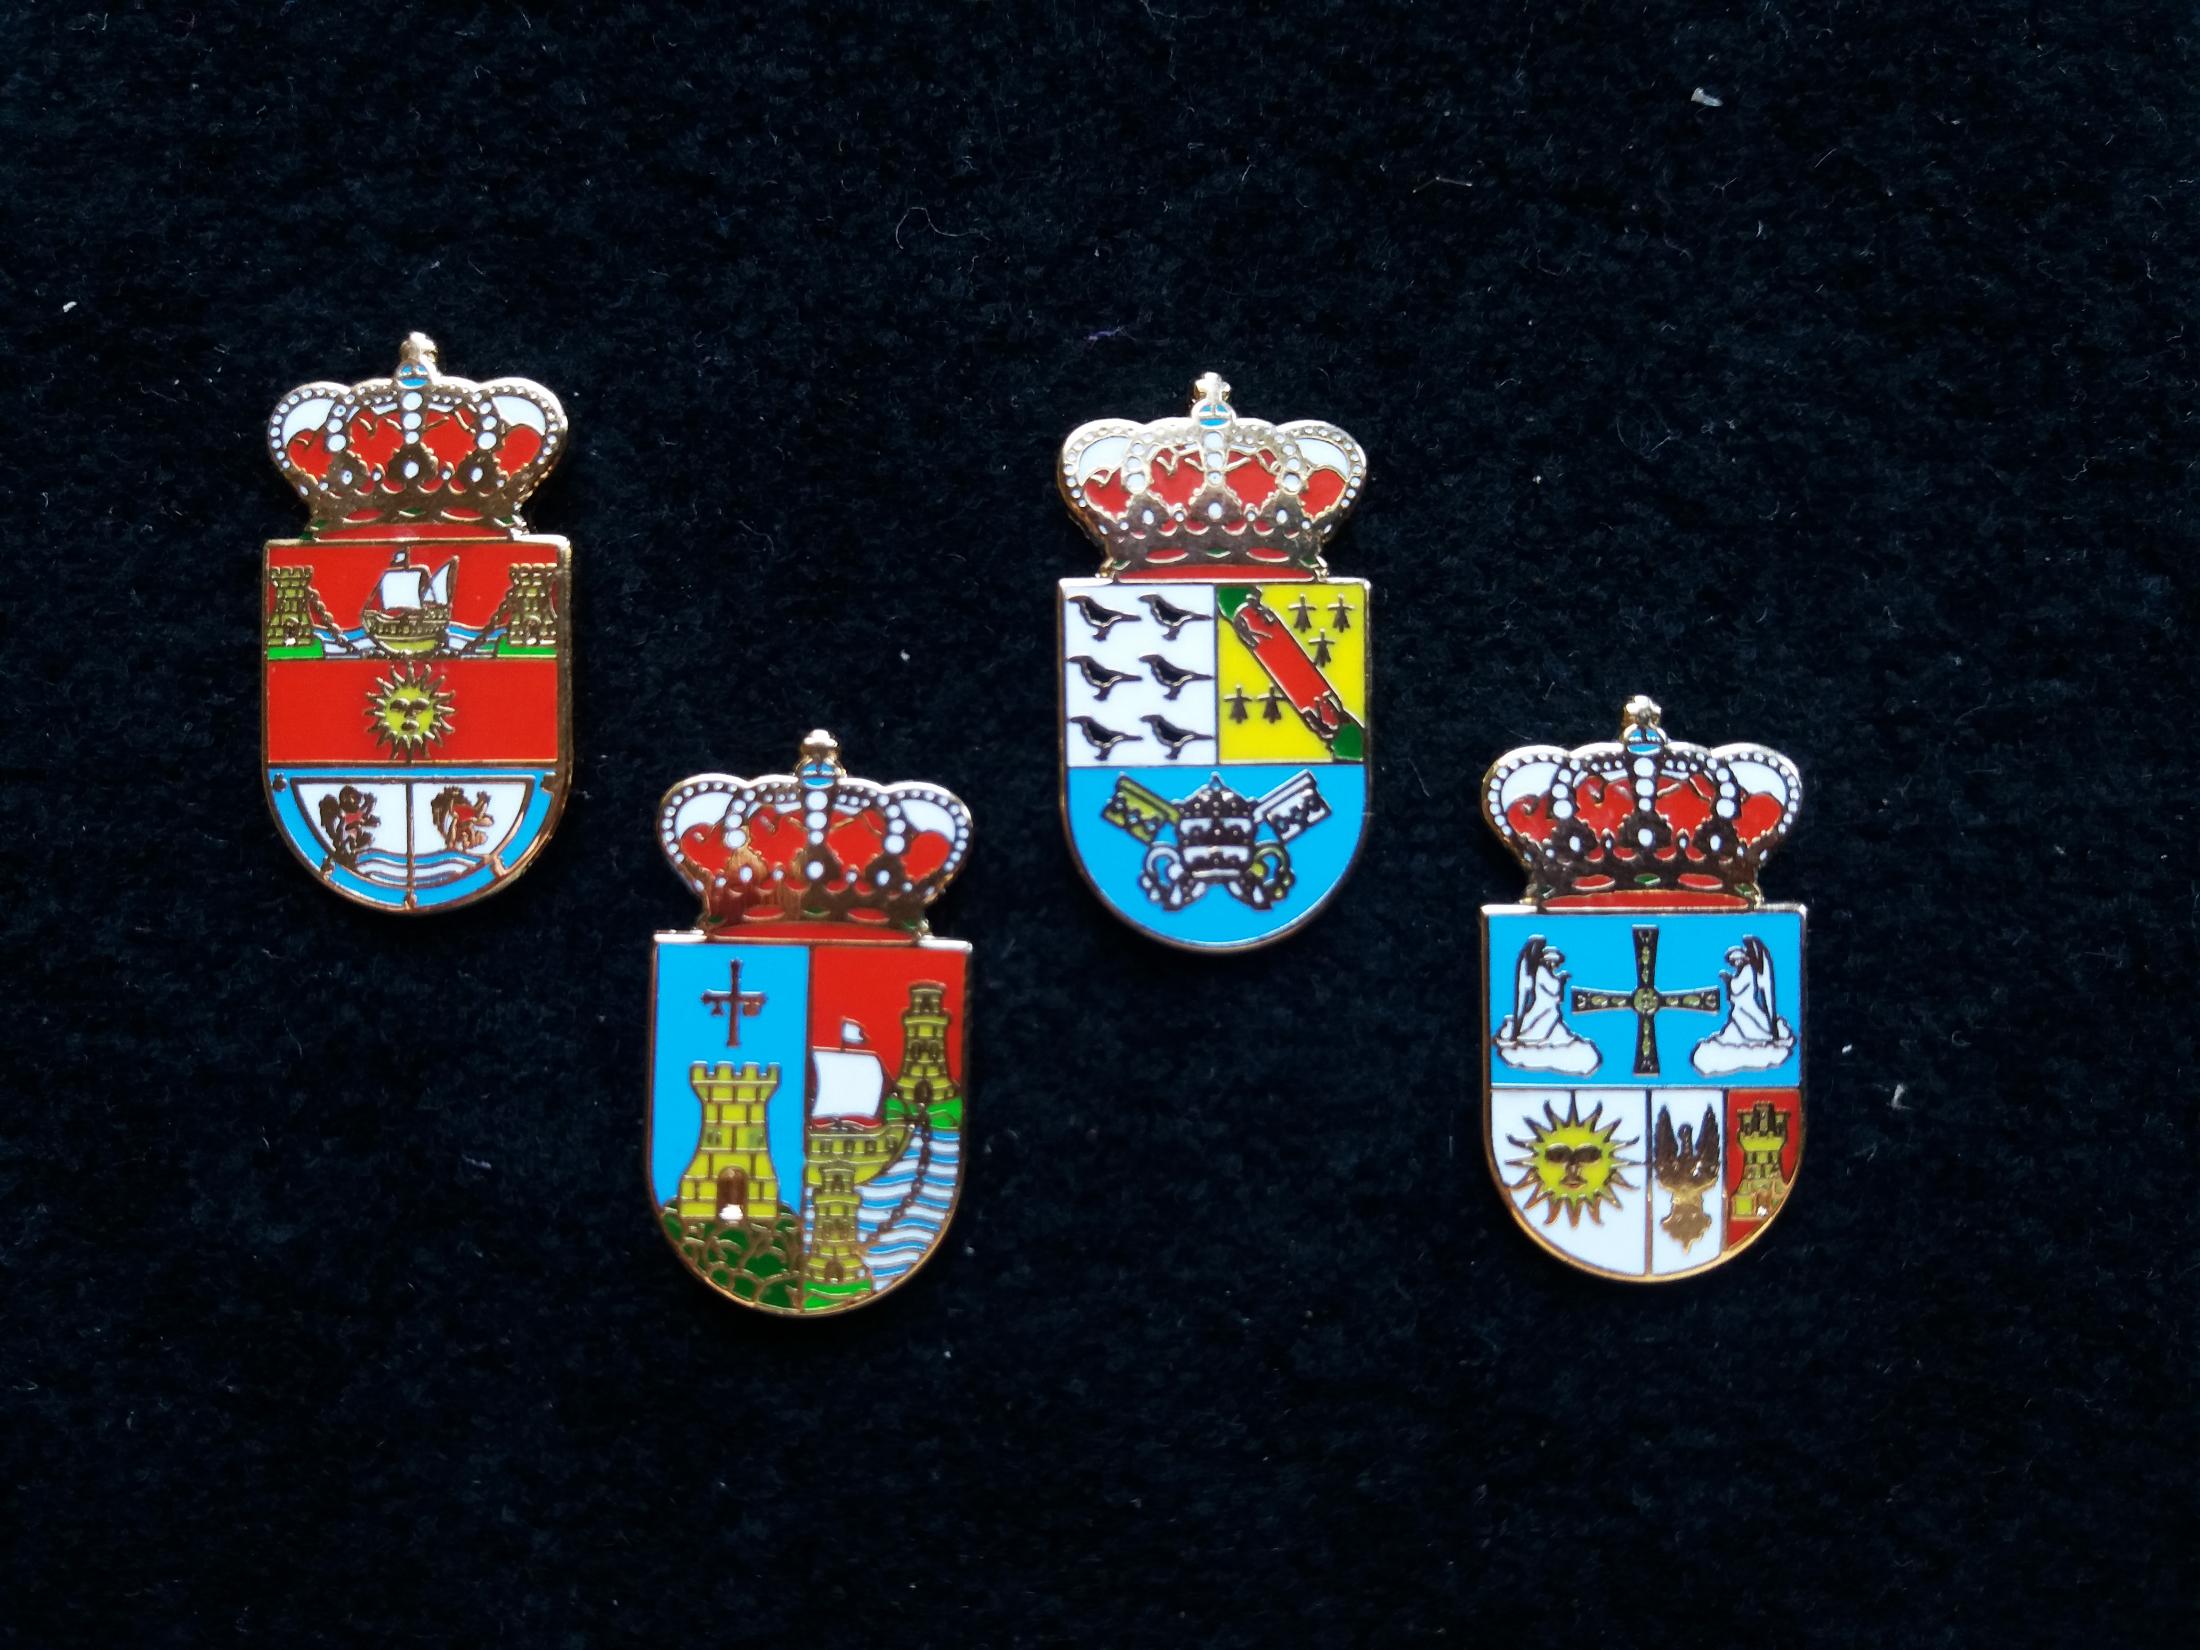 Corvera, Castrillón, Cudillero and Caravia heraldic pins